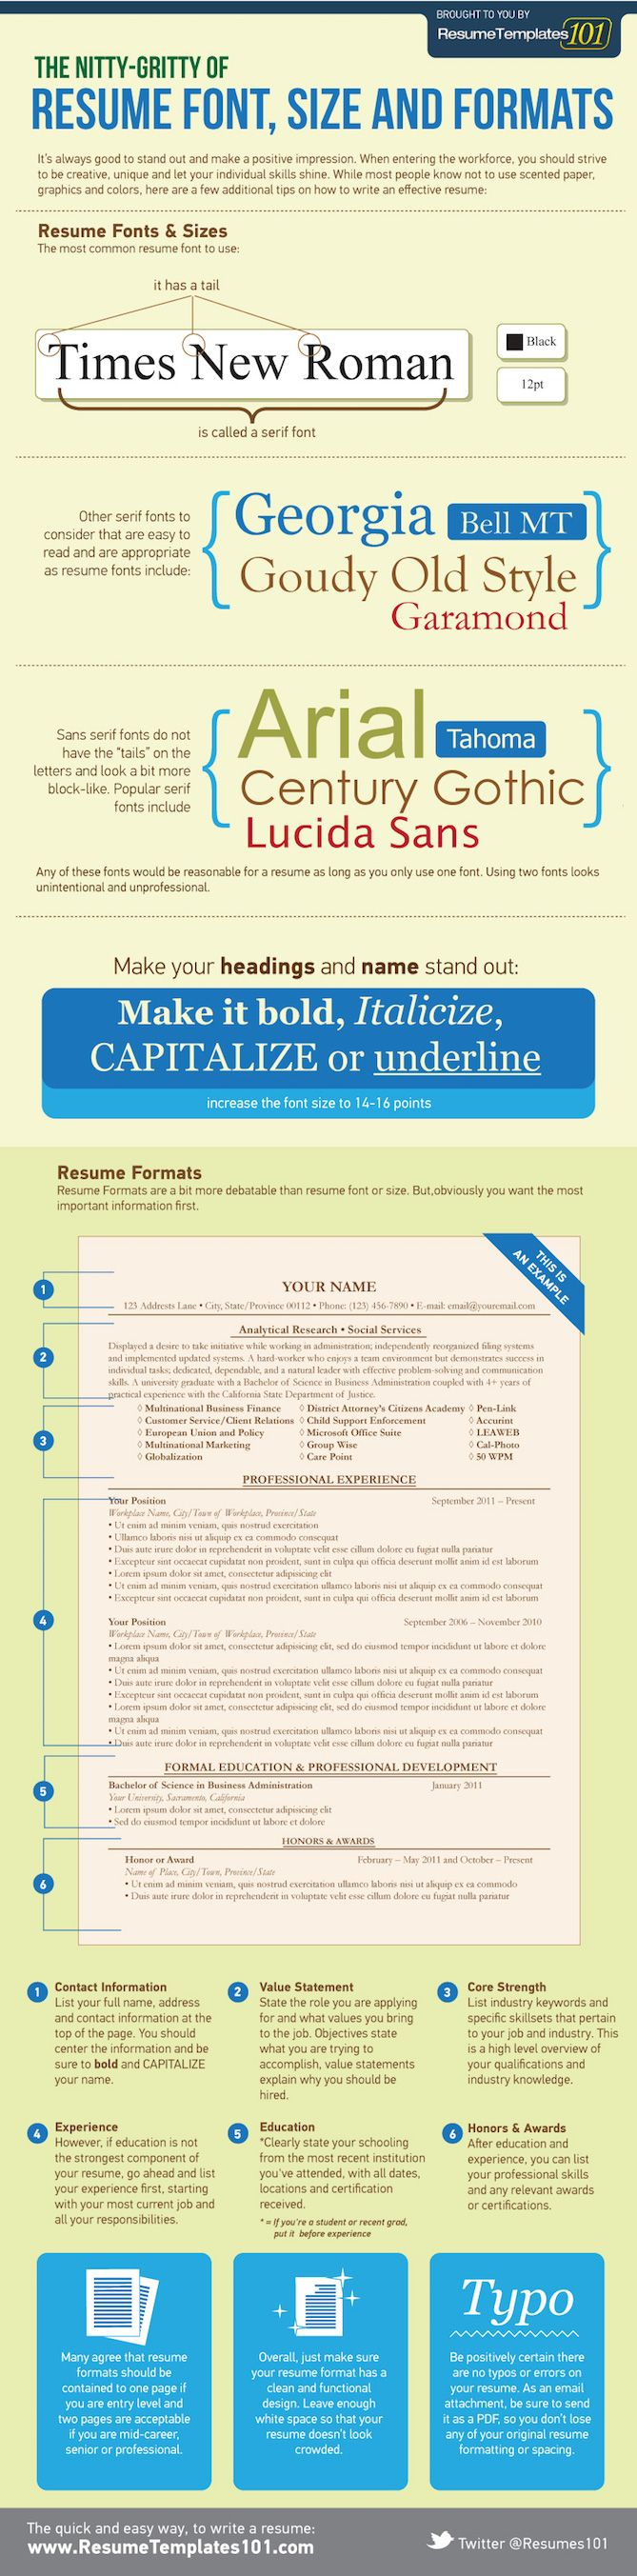 15 Best Resume Tips Images On Pinterest Resume Tips Resume And Cv